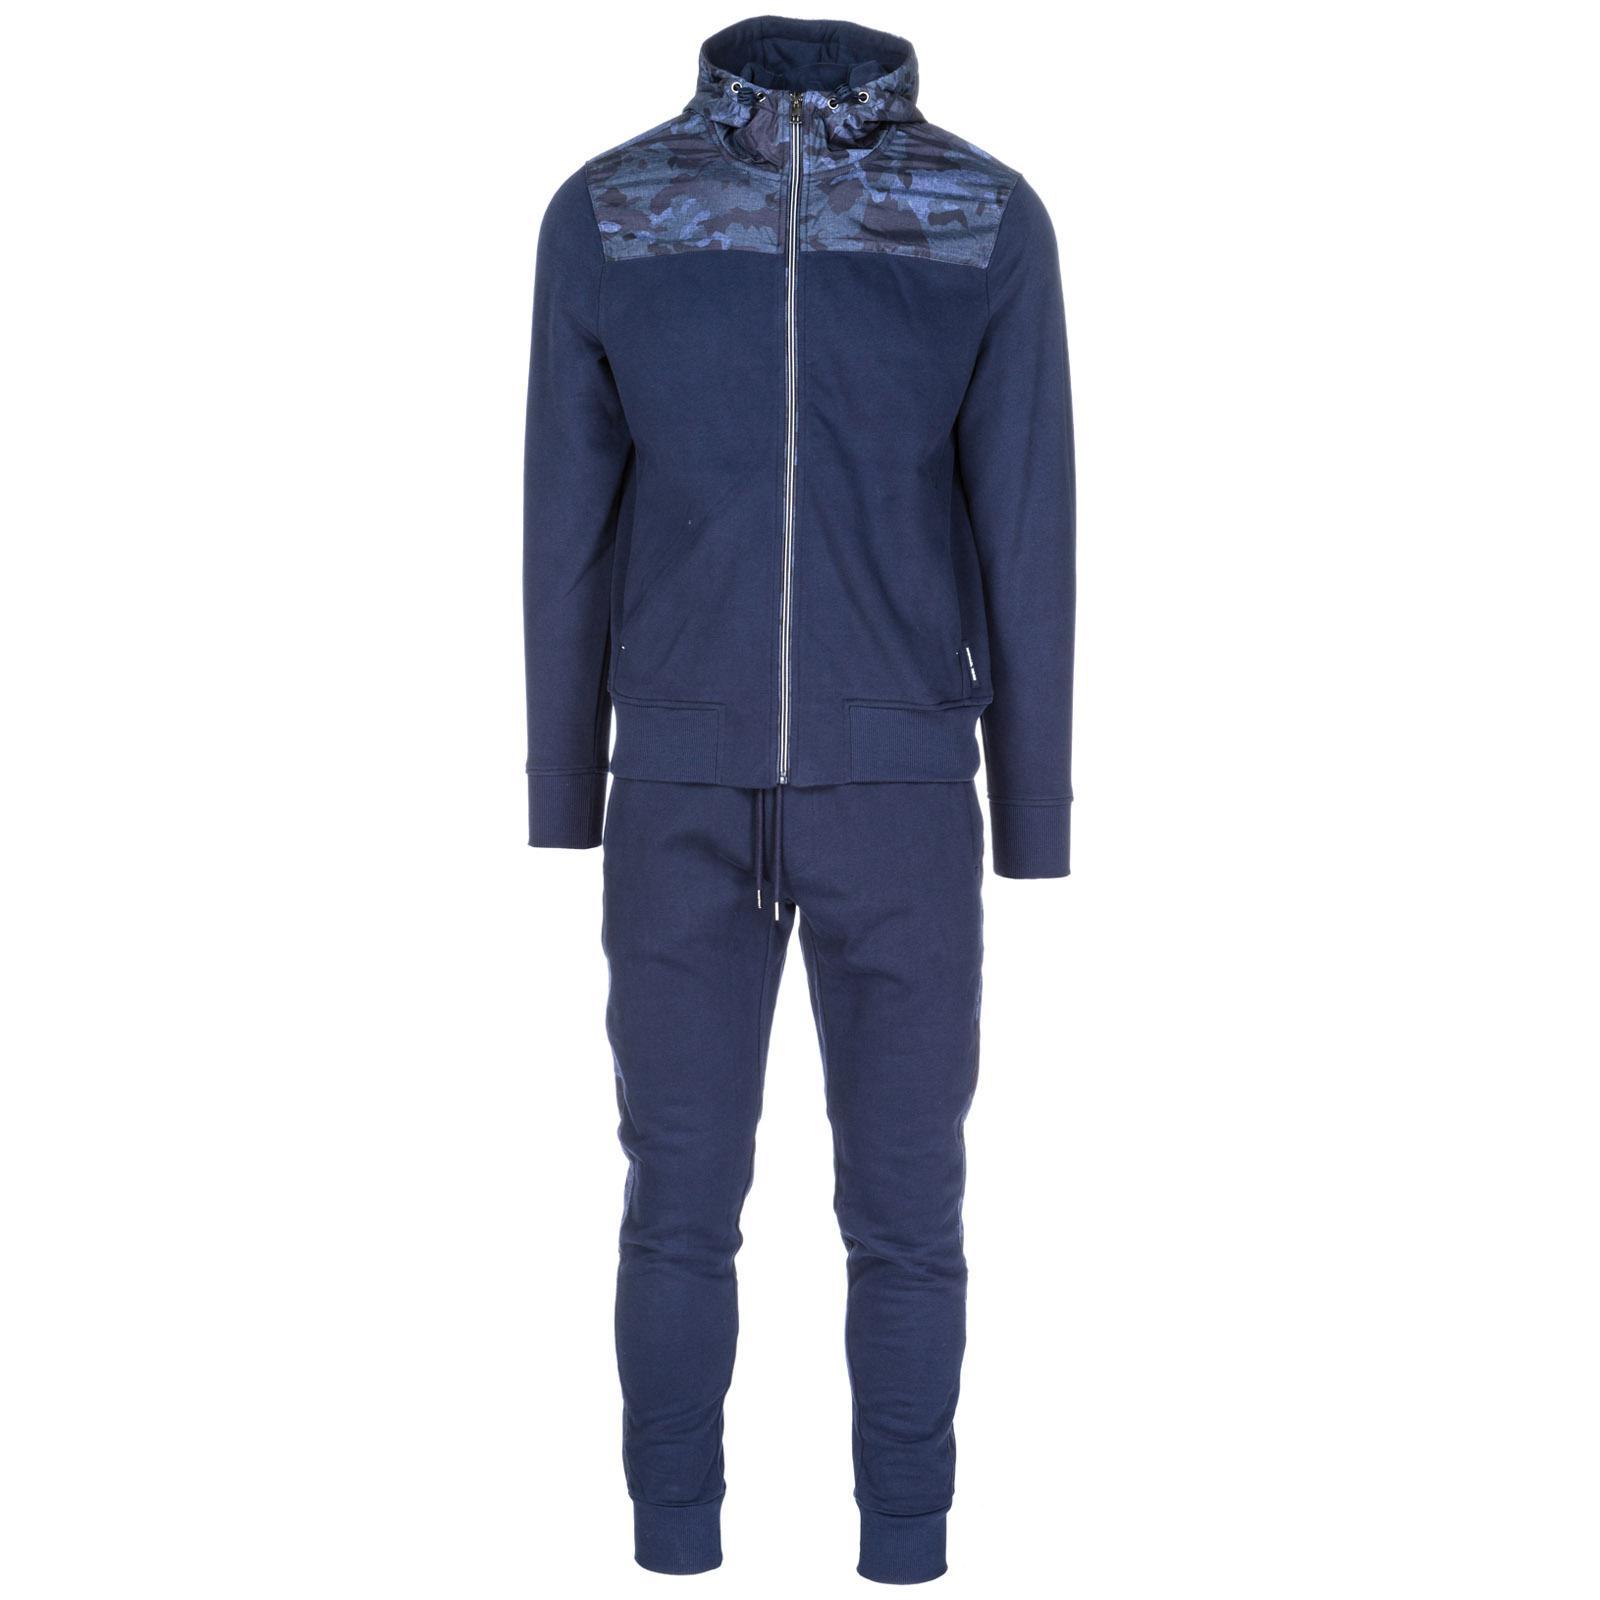 Michael Kors Herren Jumpsuit Fashion Anzug Sweatshirt In Blue